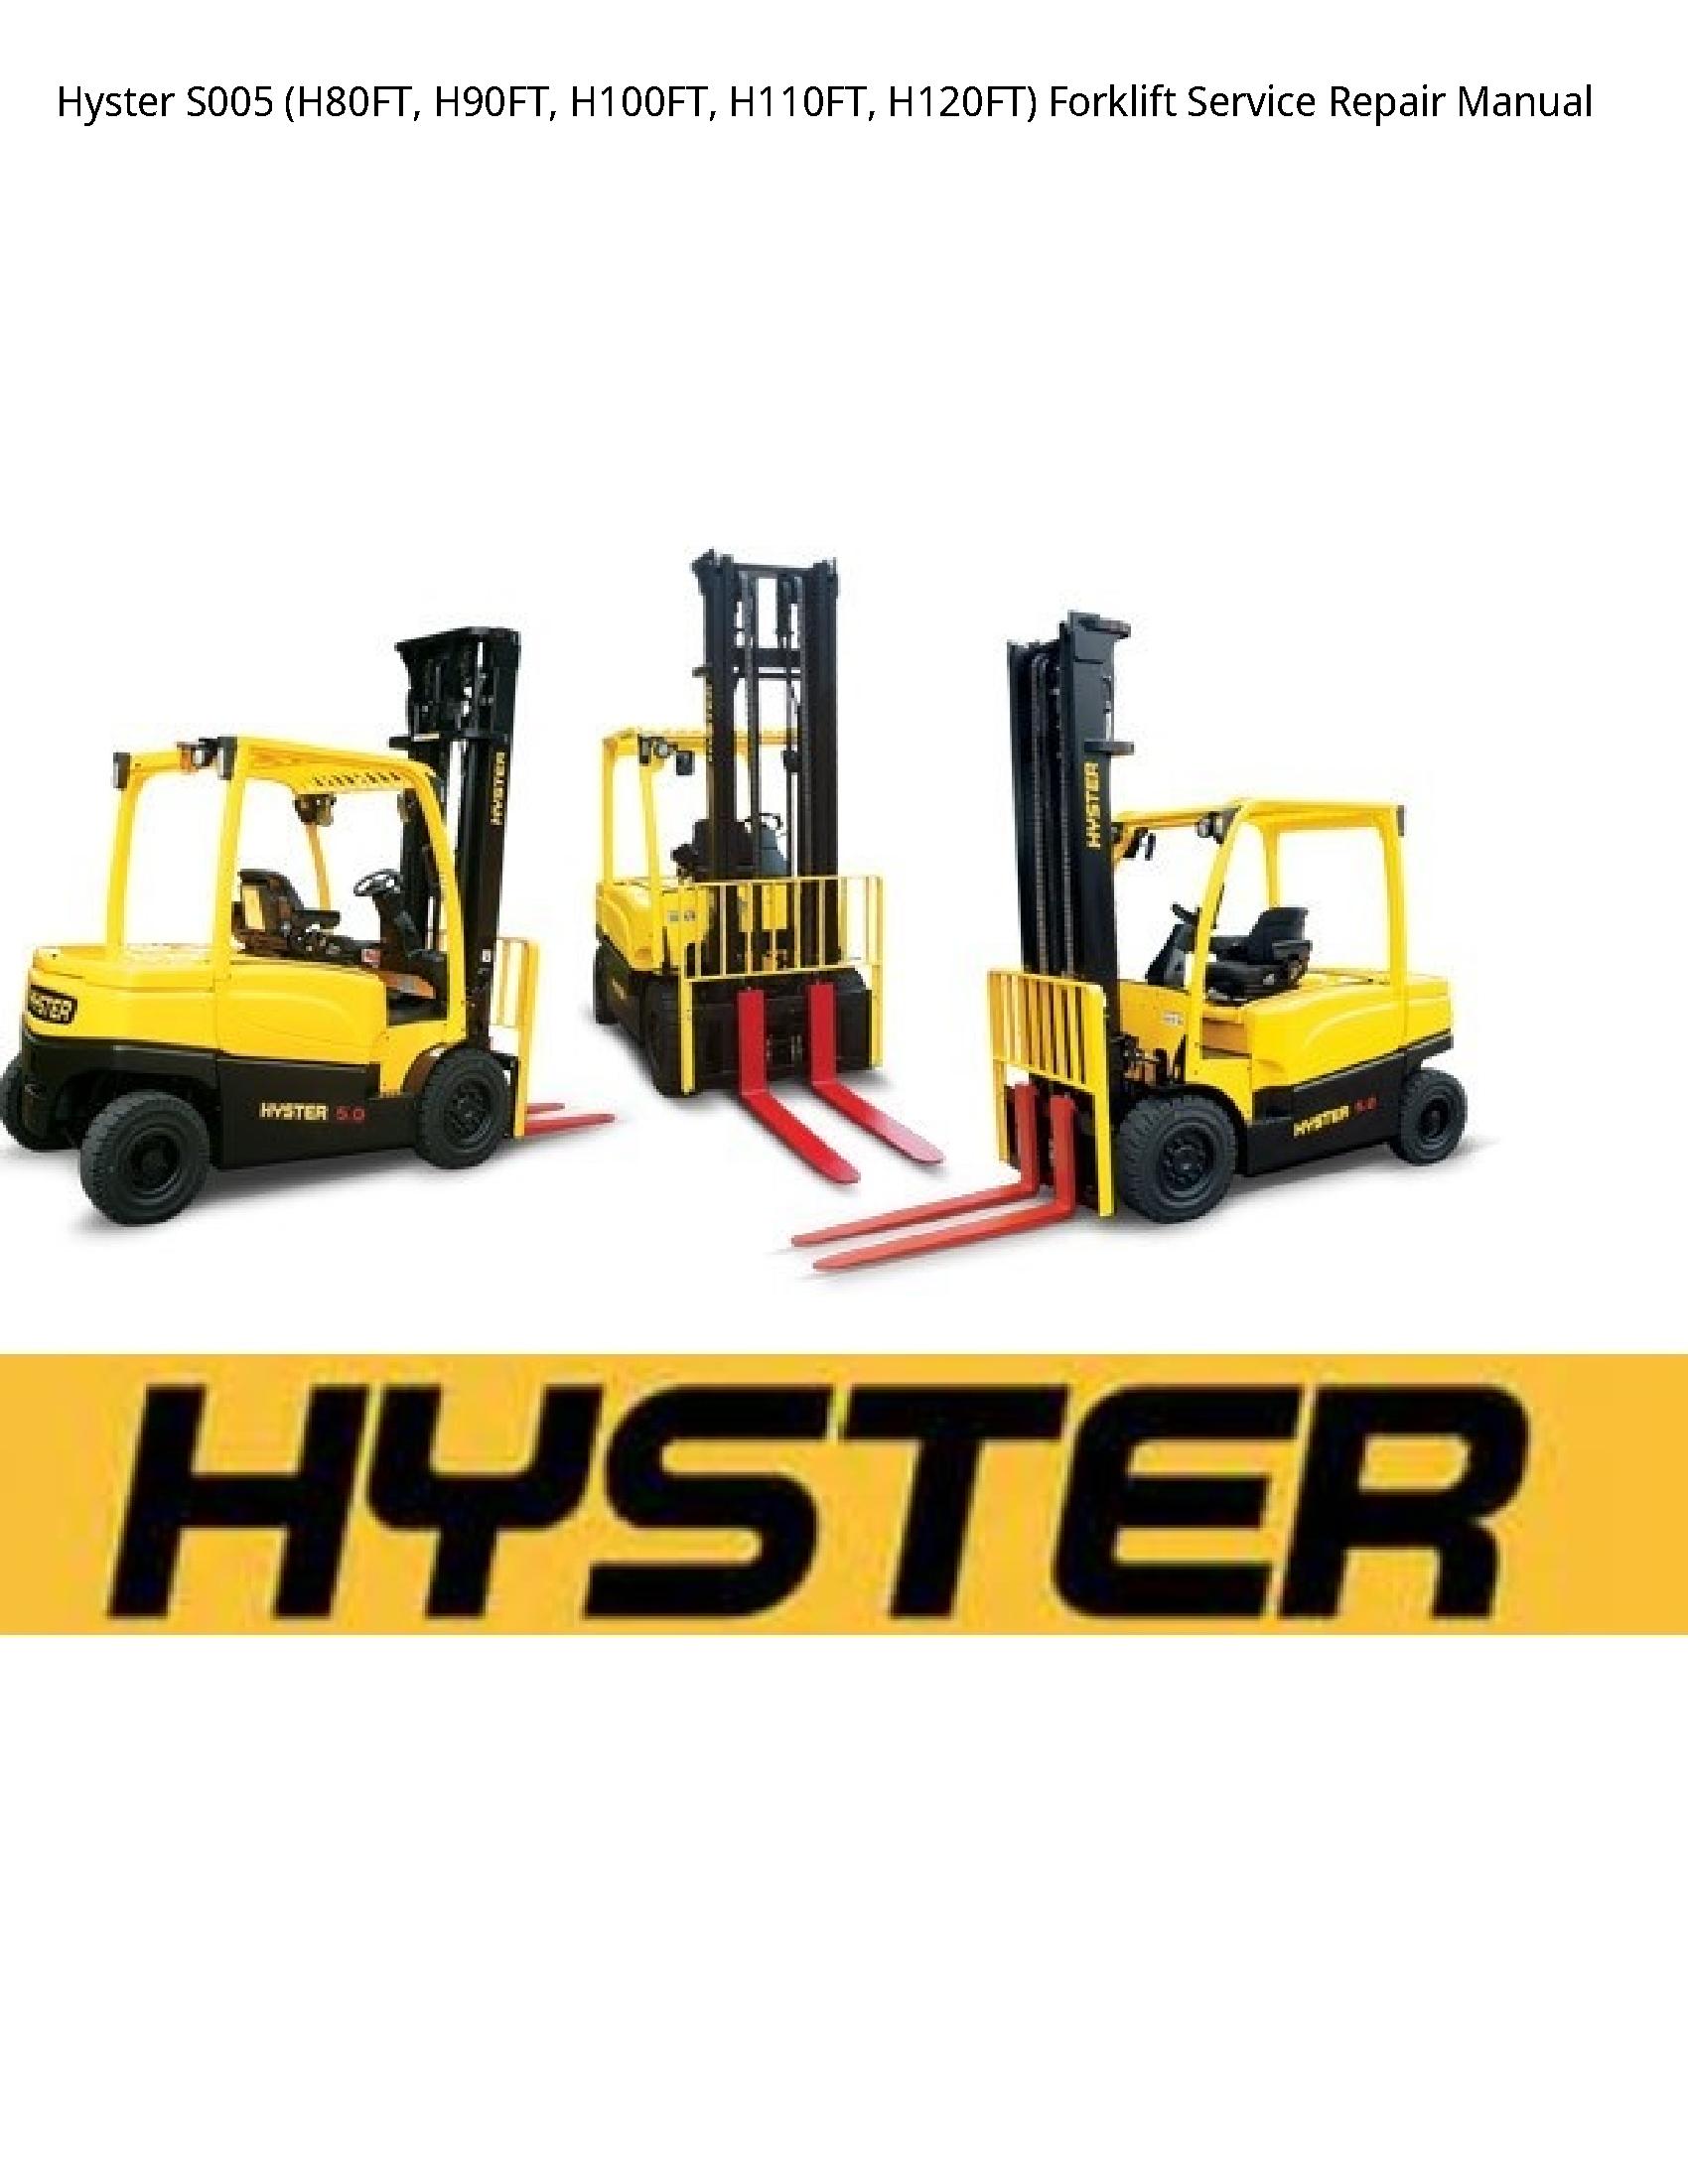 Hyster S005 Forklift Manual Repair Manuals Forklift Preventive Maintenance